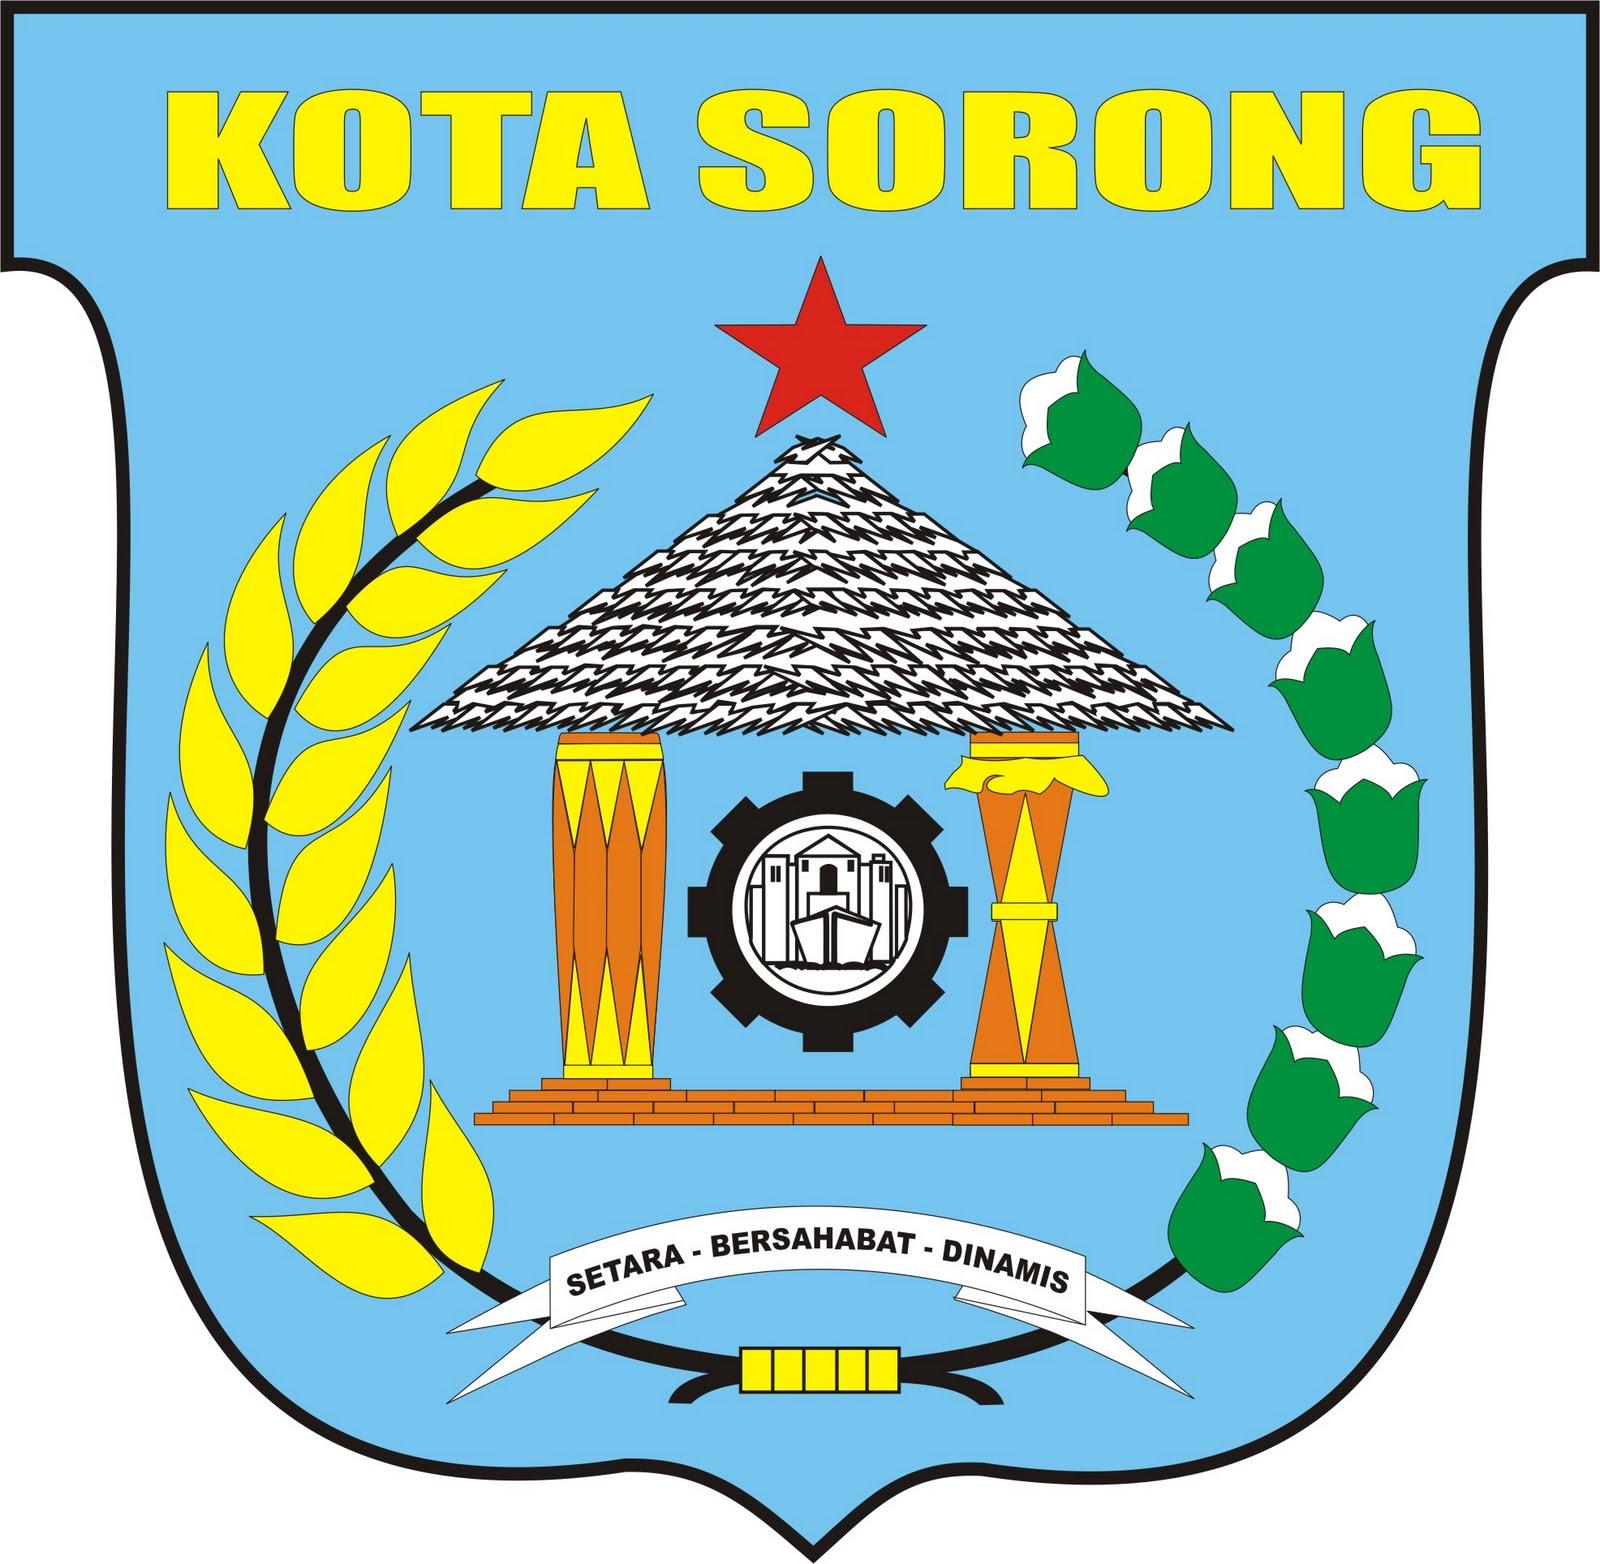 Berkas Lambang Kota Sorong Jpg Wikipedia Bahasa Indonesia Ensiklopedia Bebas